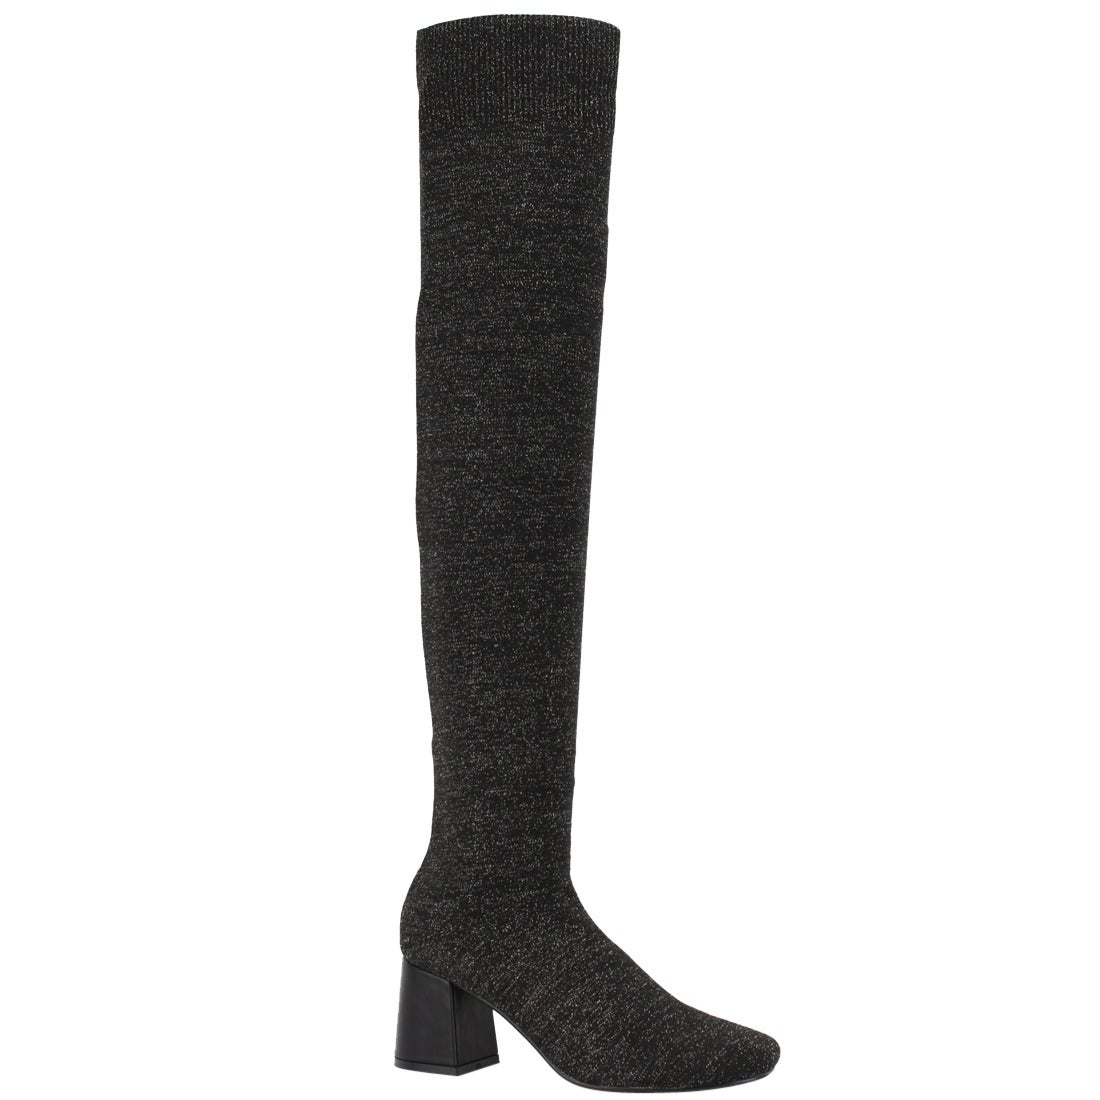 c688df625 Beston EI94 Women s Stretchy Sock Knitting Pull on Block Heel Thigh Hight  Boots